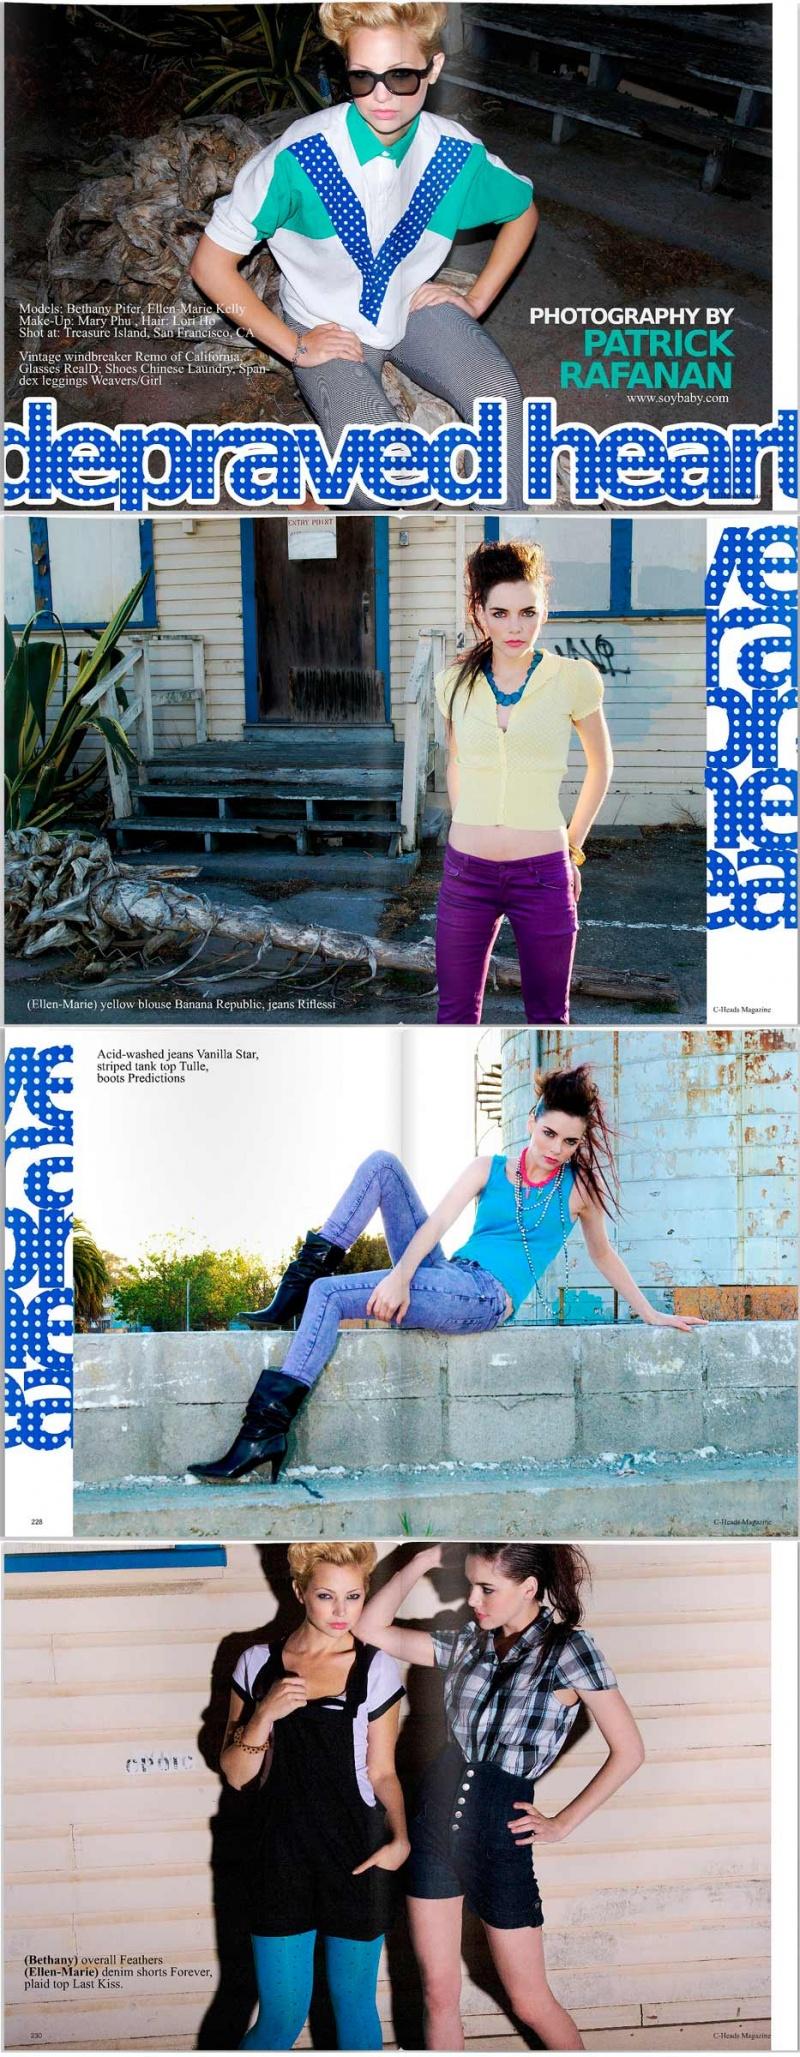 Jul 03, 2009 C-Heads Magazine #16 | makeup: Mary Phu for Sugarninjas | hair: Lori Ho | models: Bethany P & Ellen-Marie